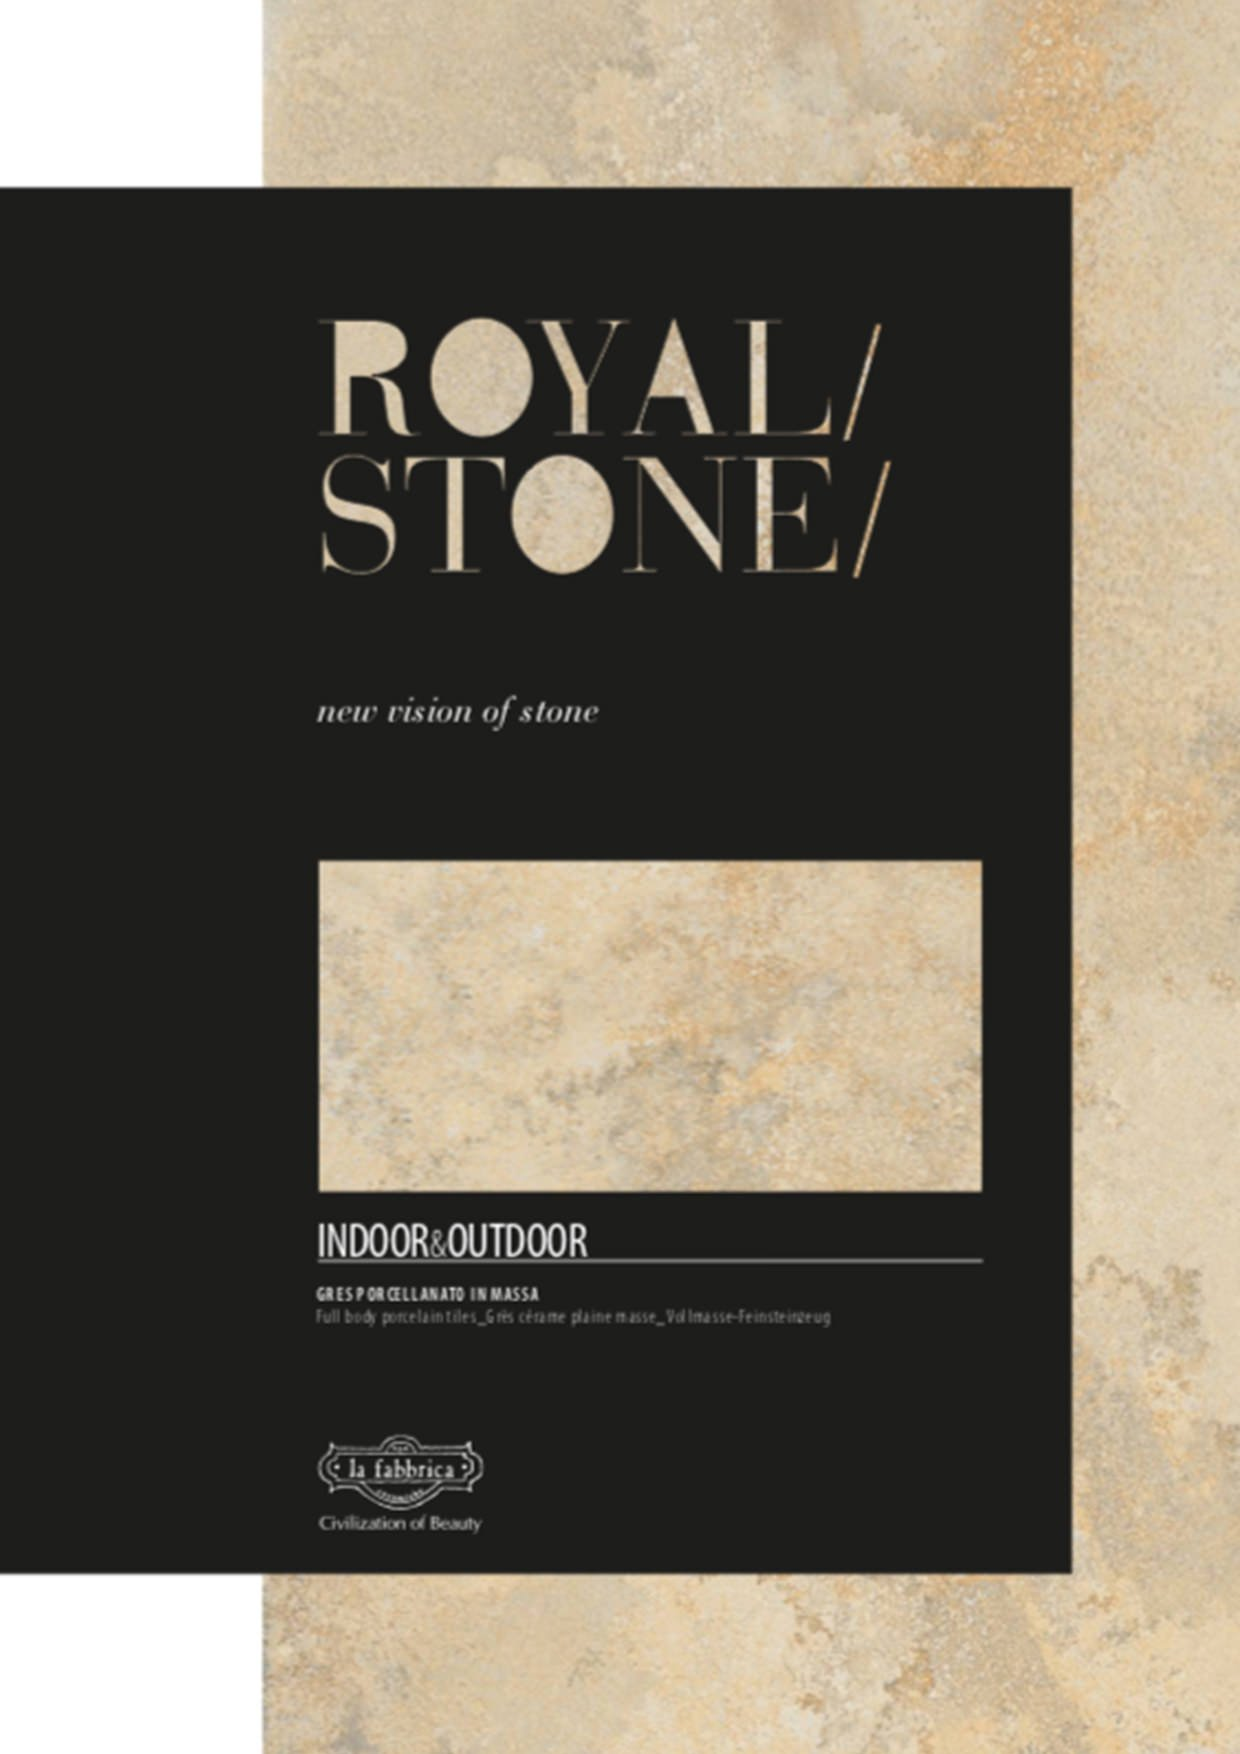 La Fabbrica Catalogo Royal Stone